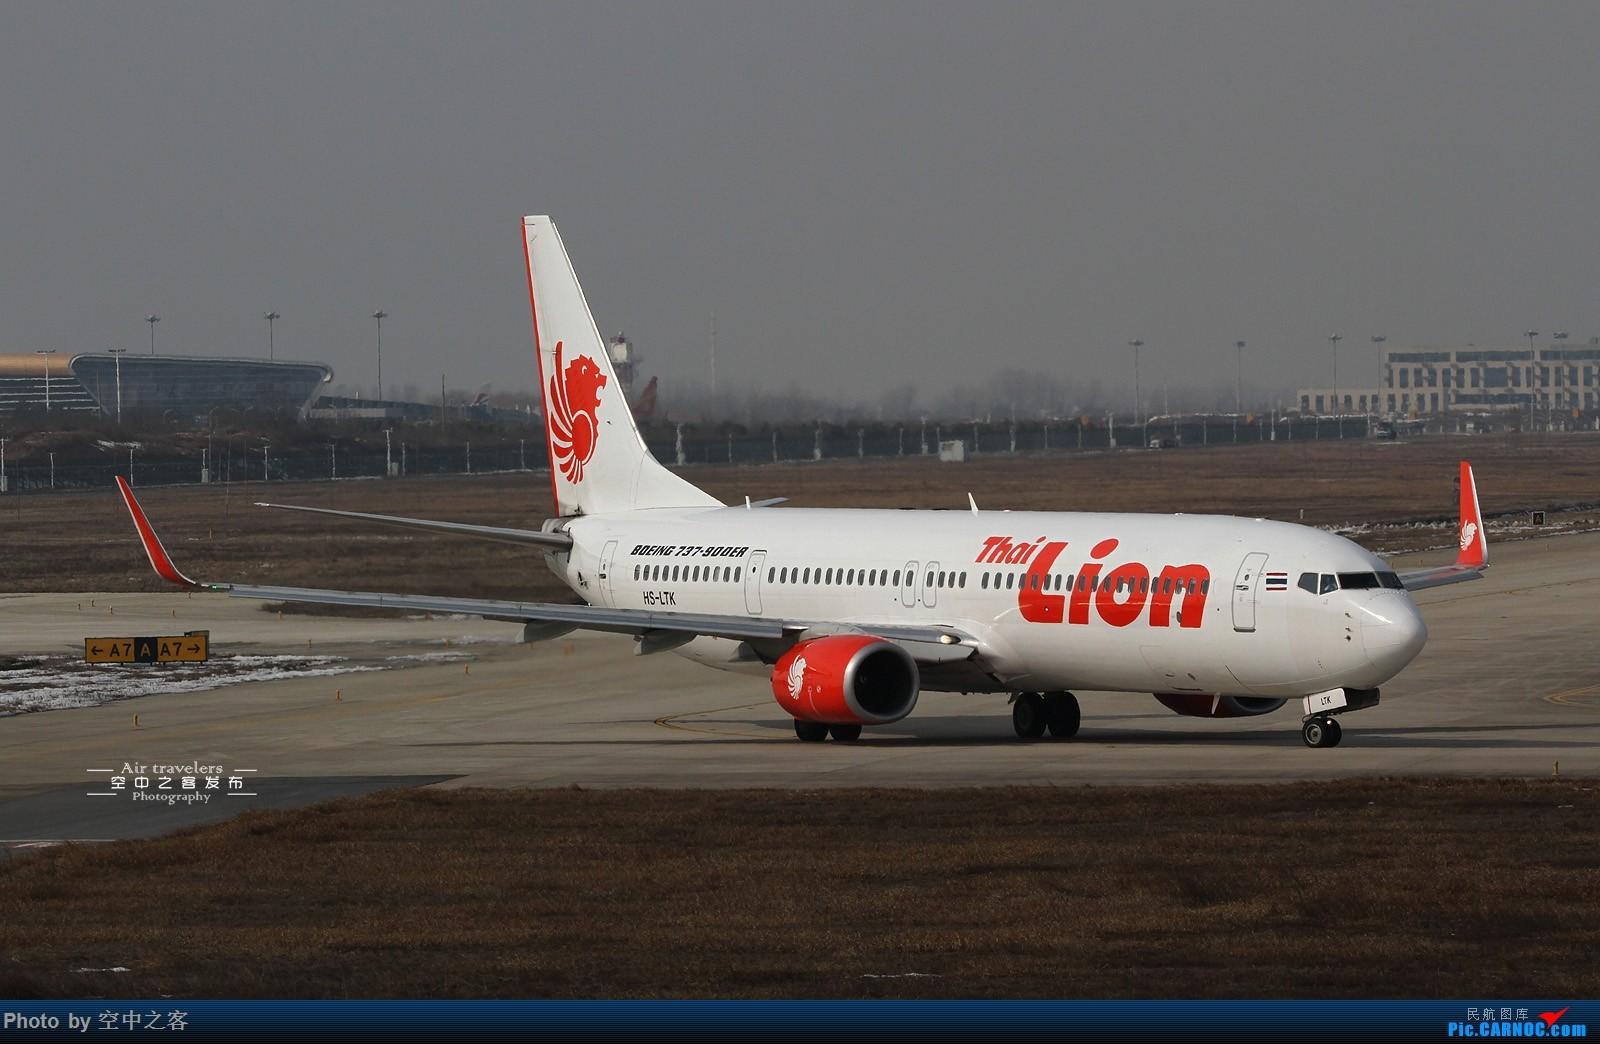 Re:[原创][合肥飞友会-霸都打机队 空中之客发布]2018立春·首次拍机活动 BOEING 737-900 HS-LTK 合肥新桥国际机场